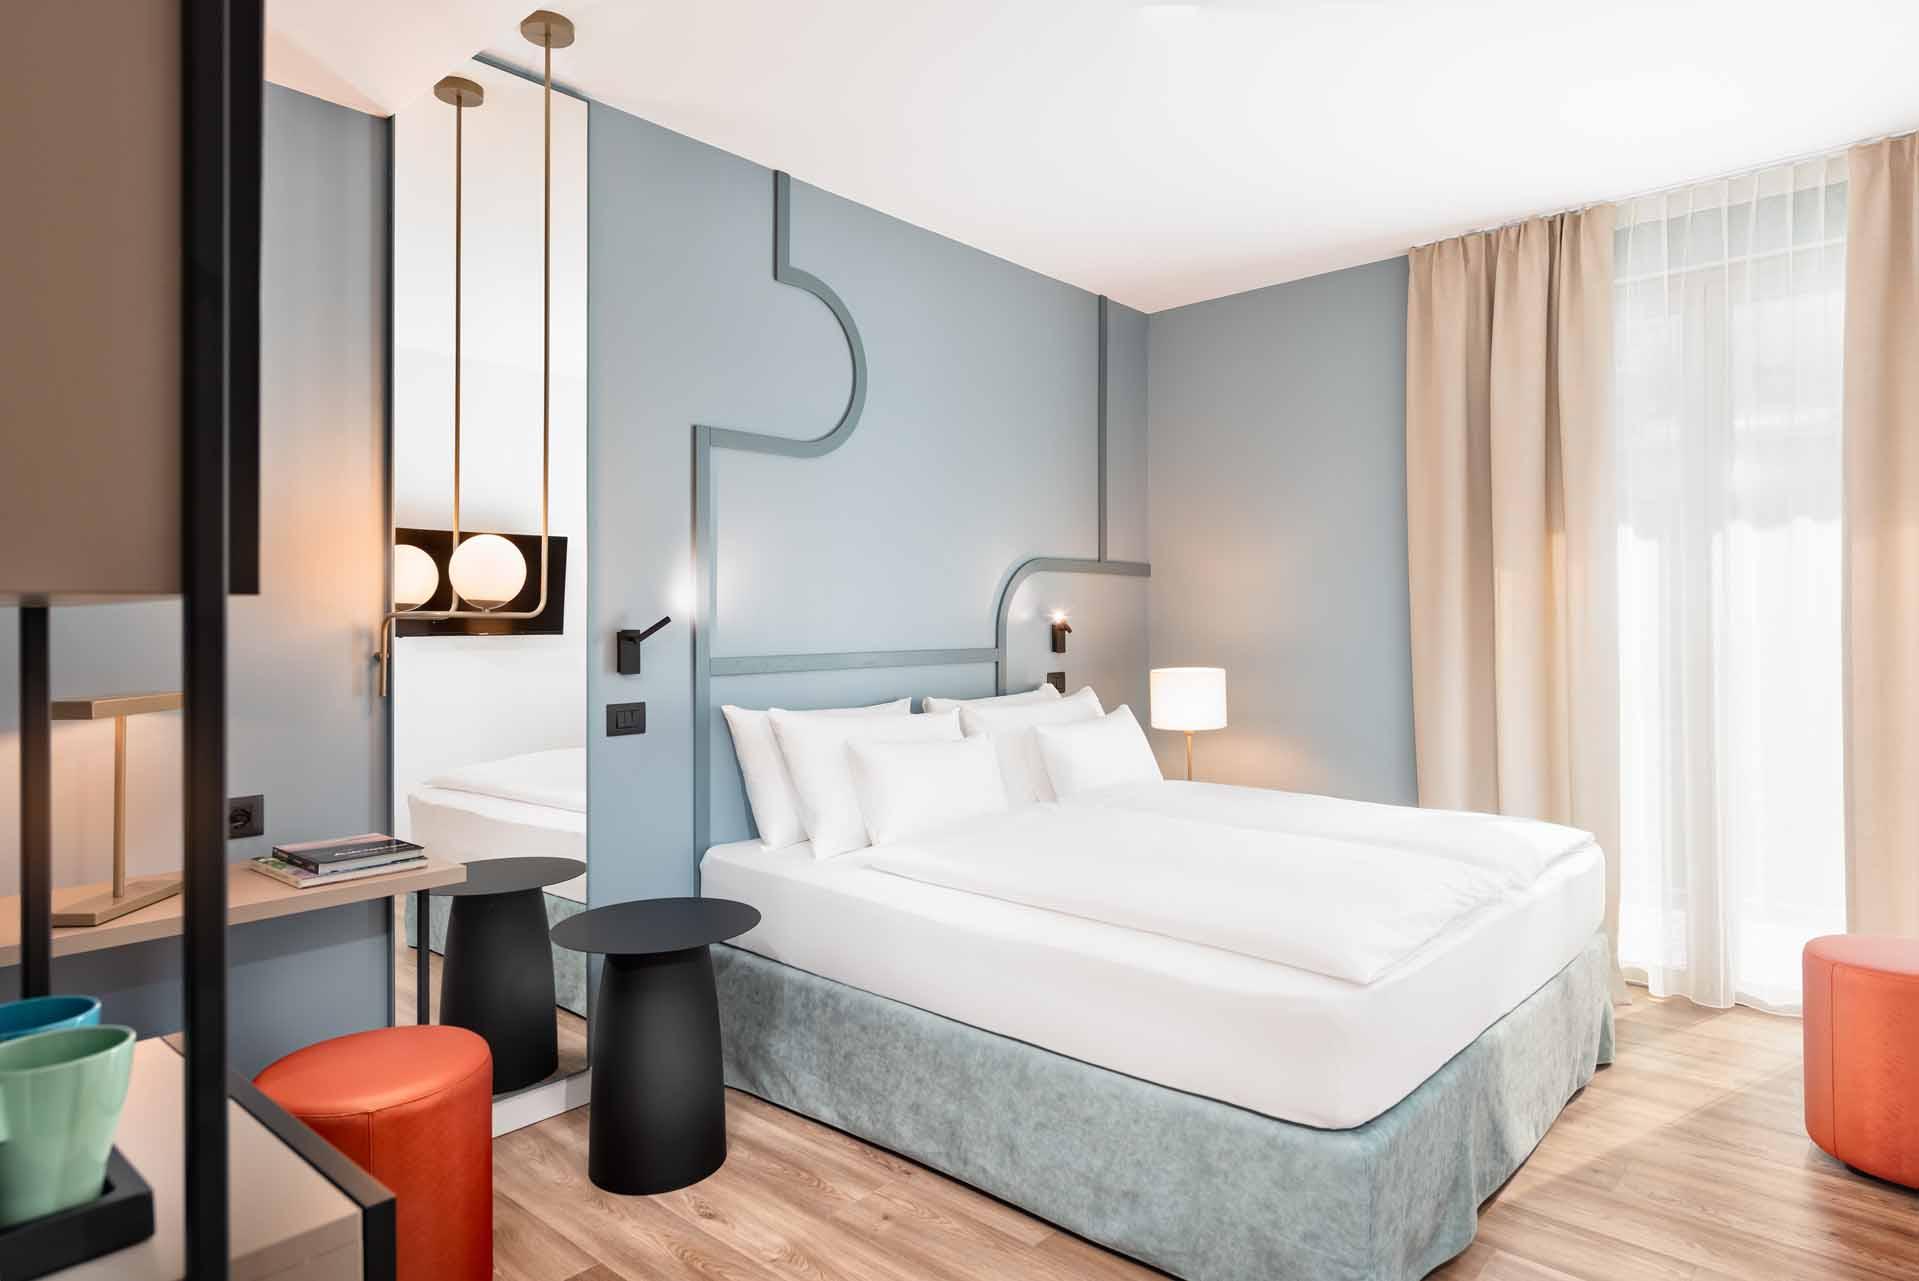 Hotel Trieste Gradisca 001